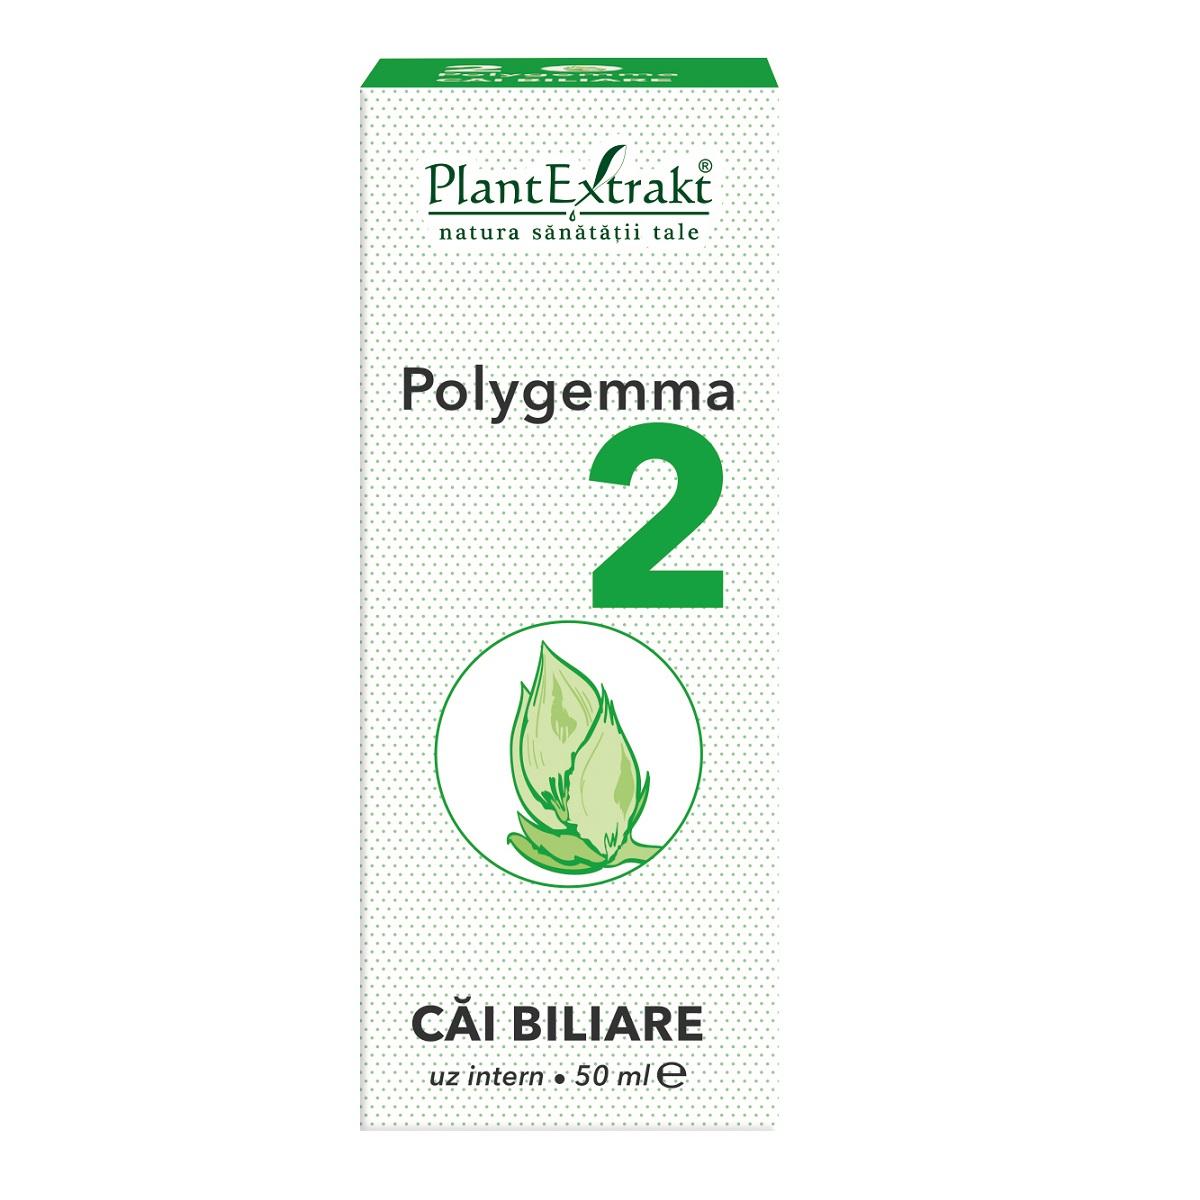 Polygemma 2, Căi biliare, 50 ml, Plant Extrakt